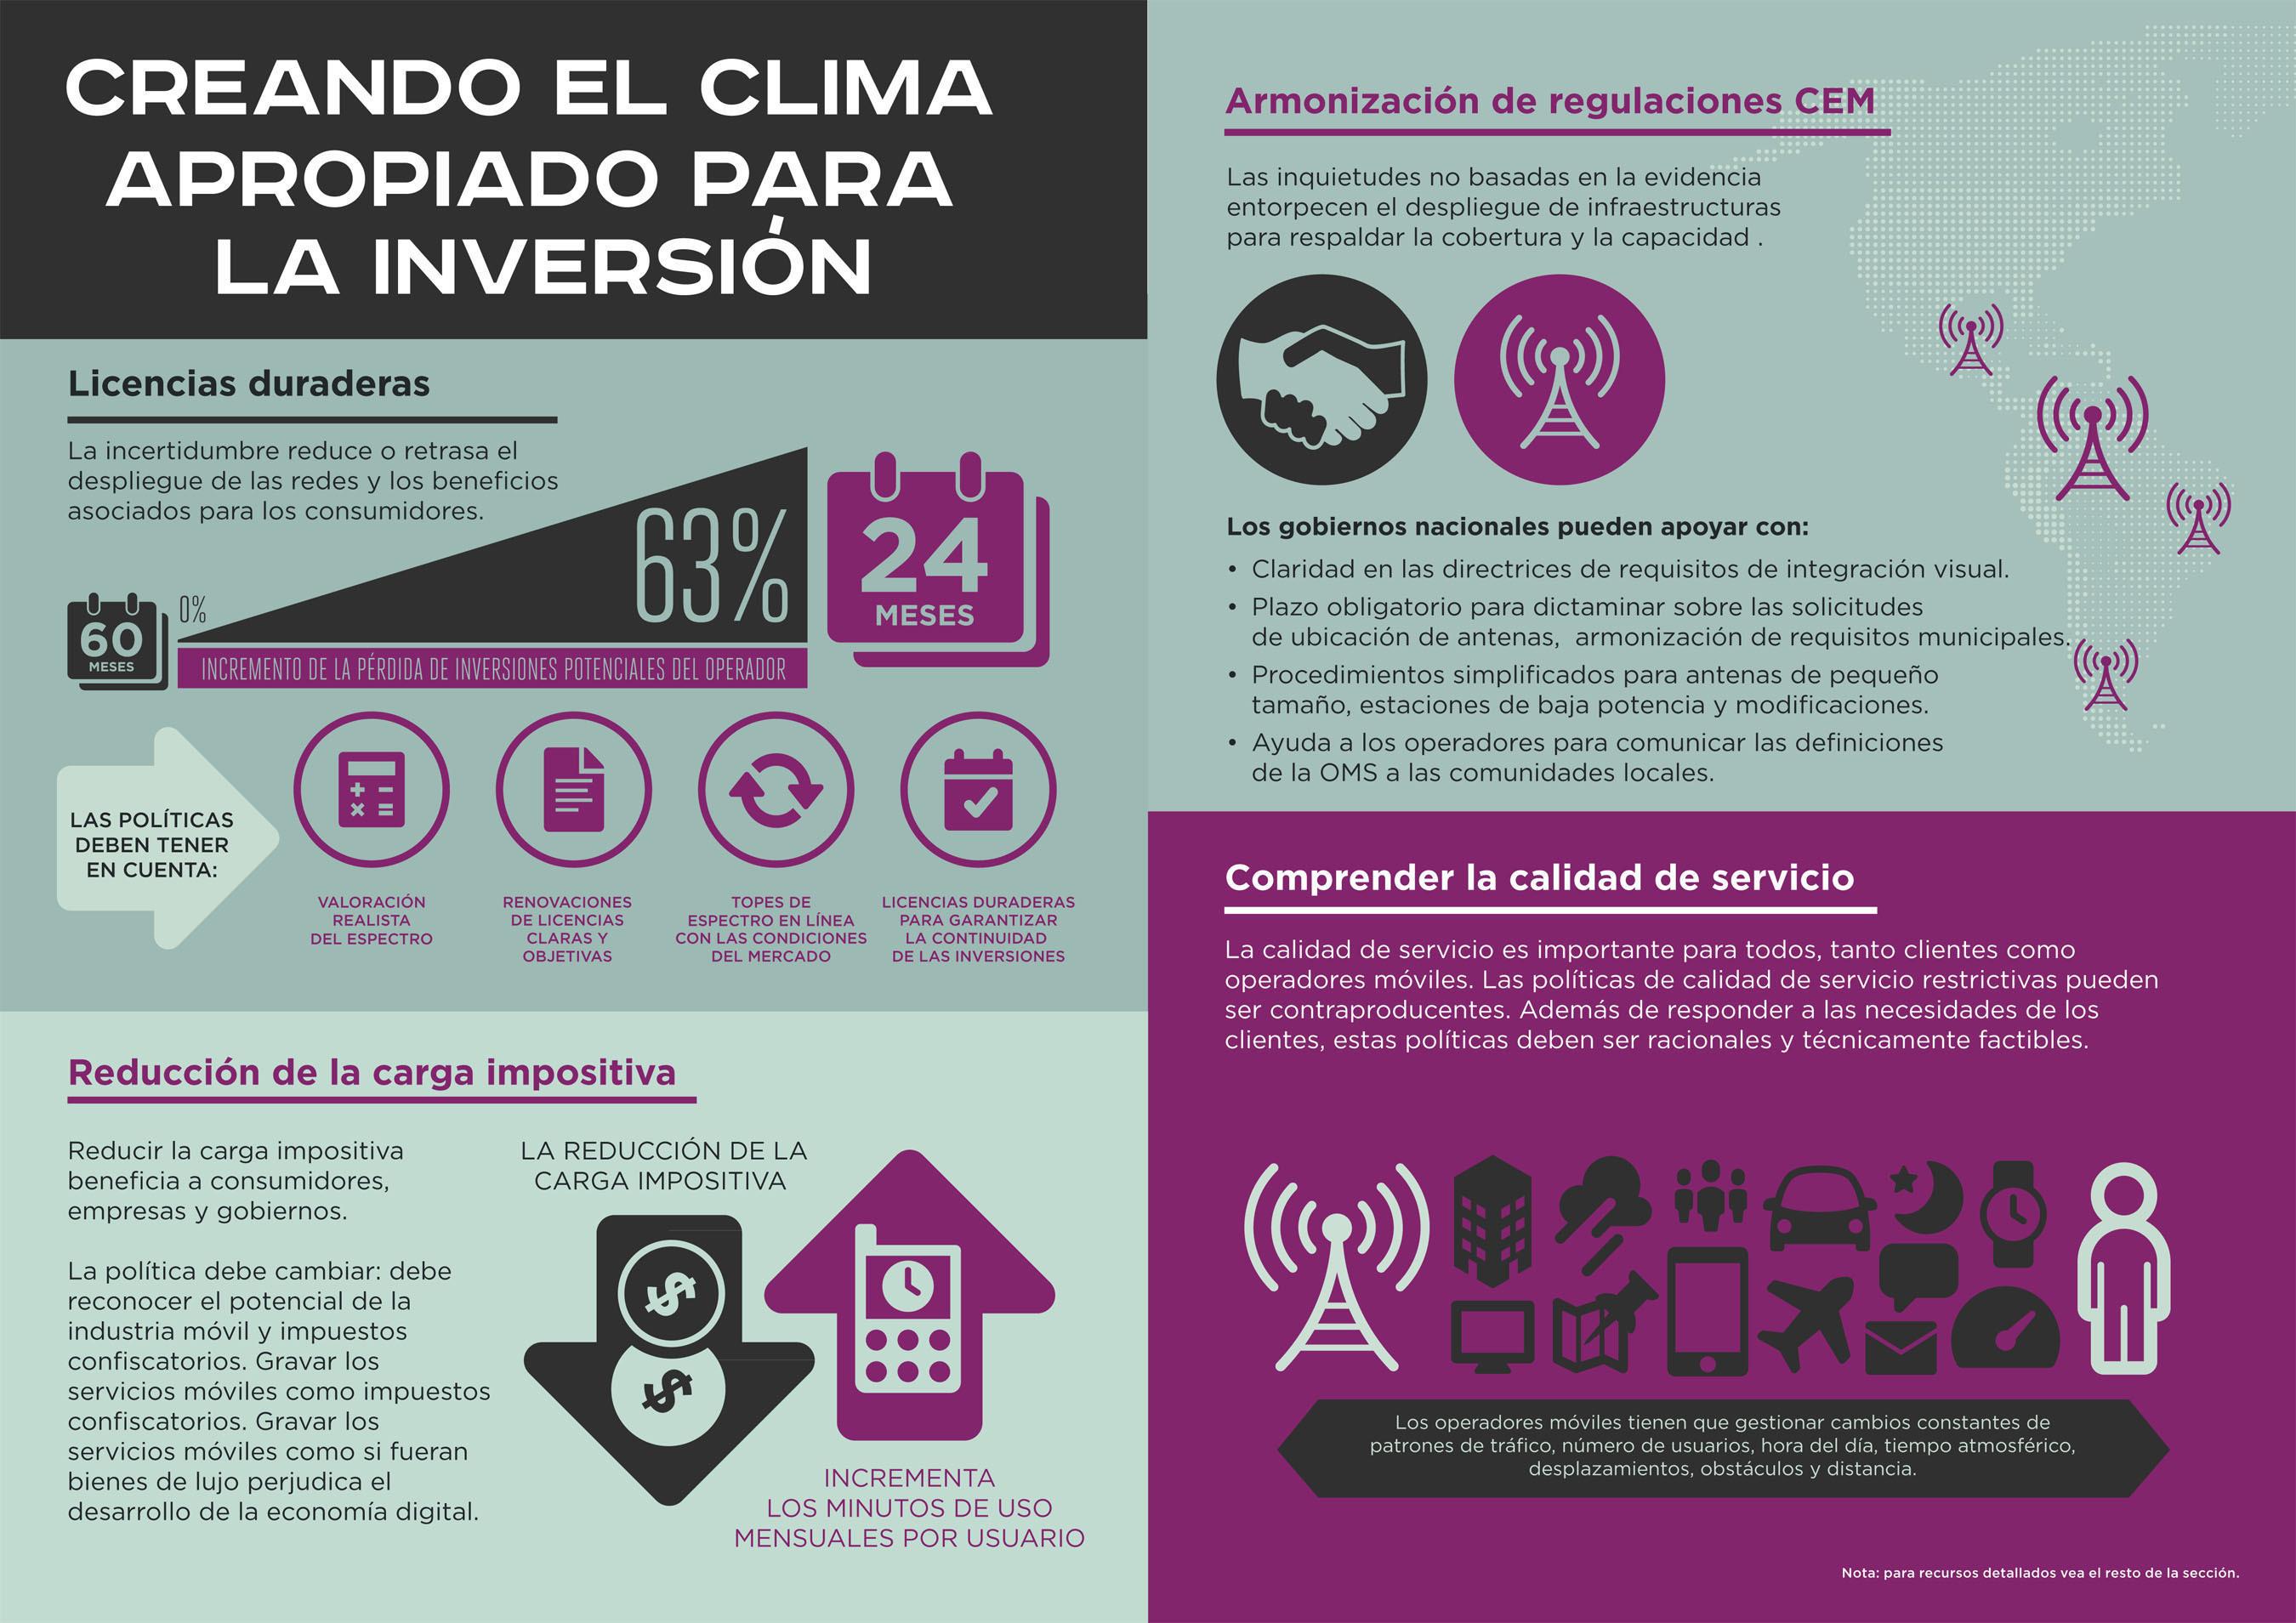 infographic. (PRNewsFoto/GSMA) (PRNewsFoto/GSMA)